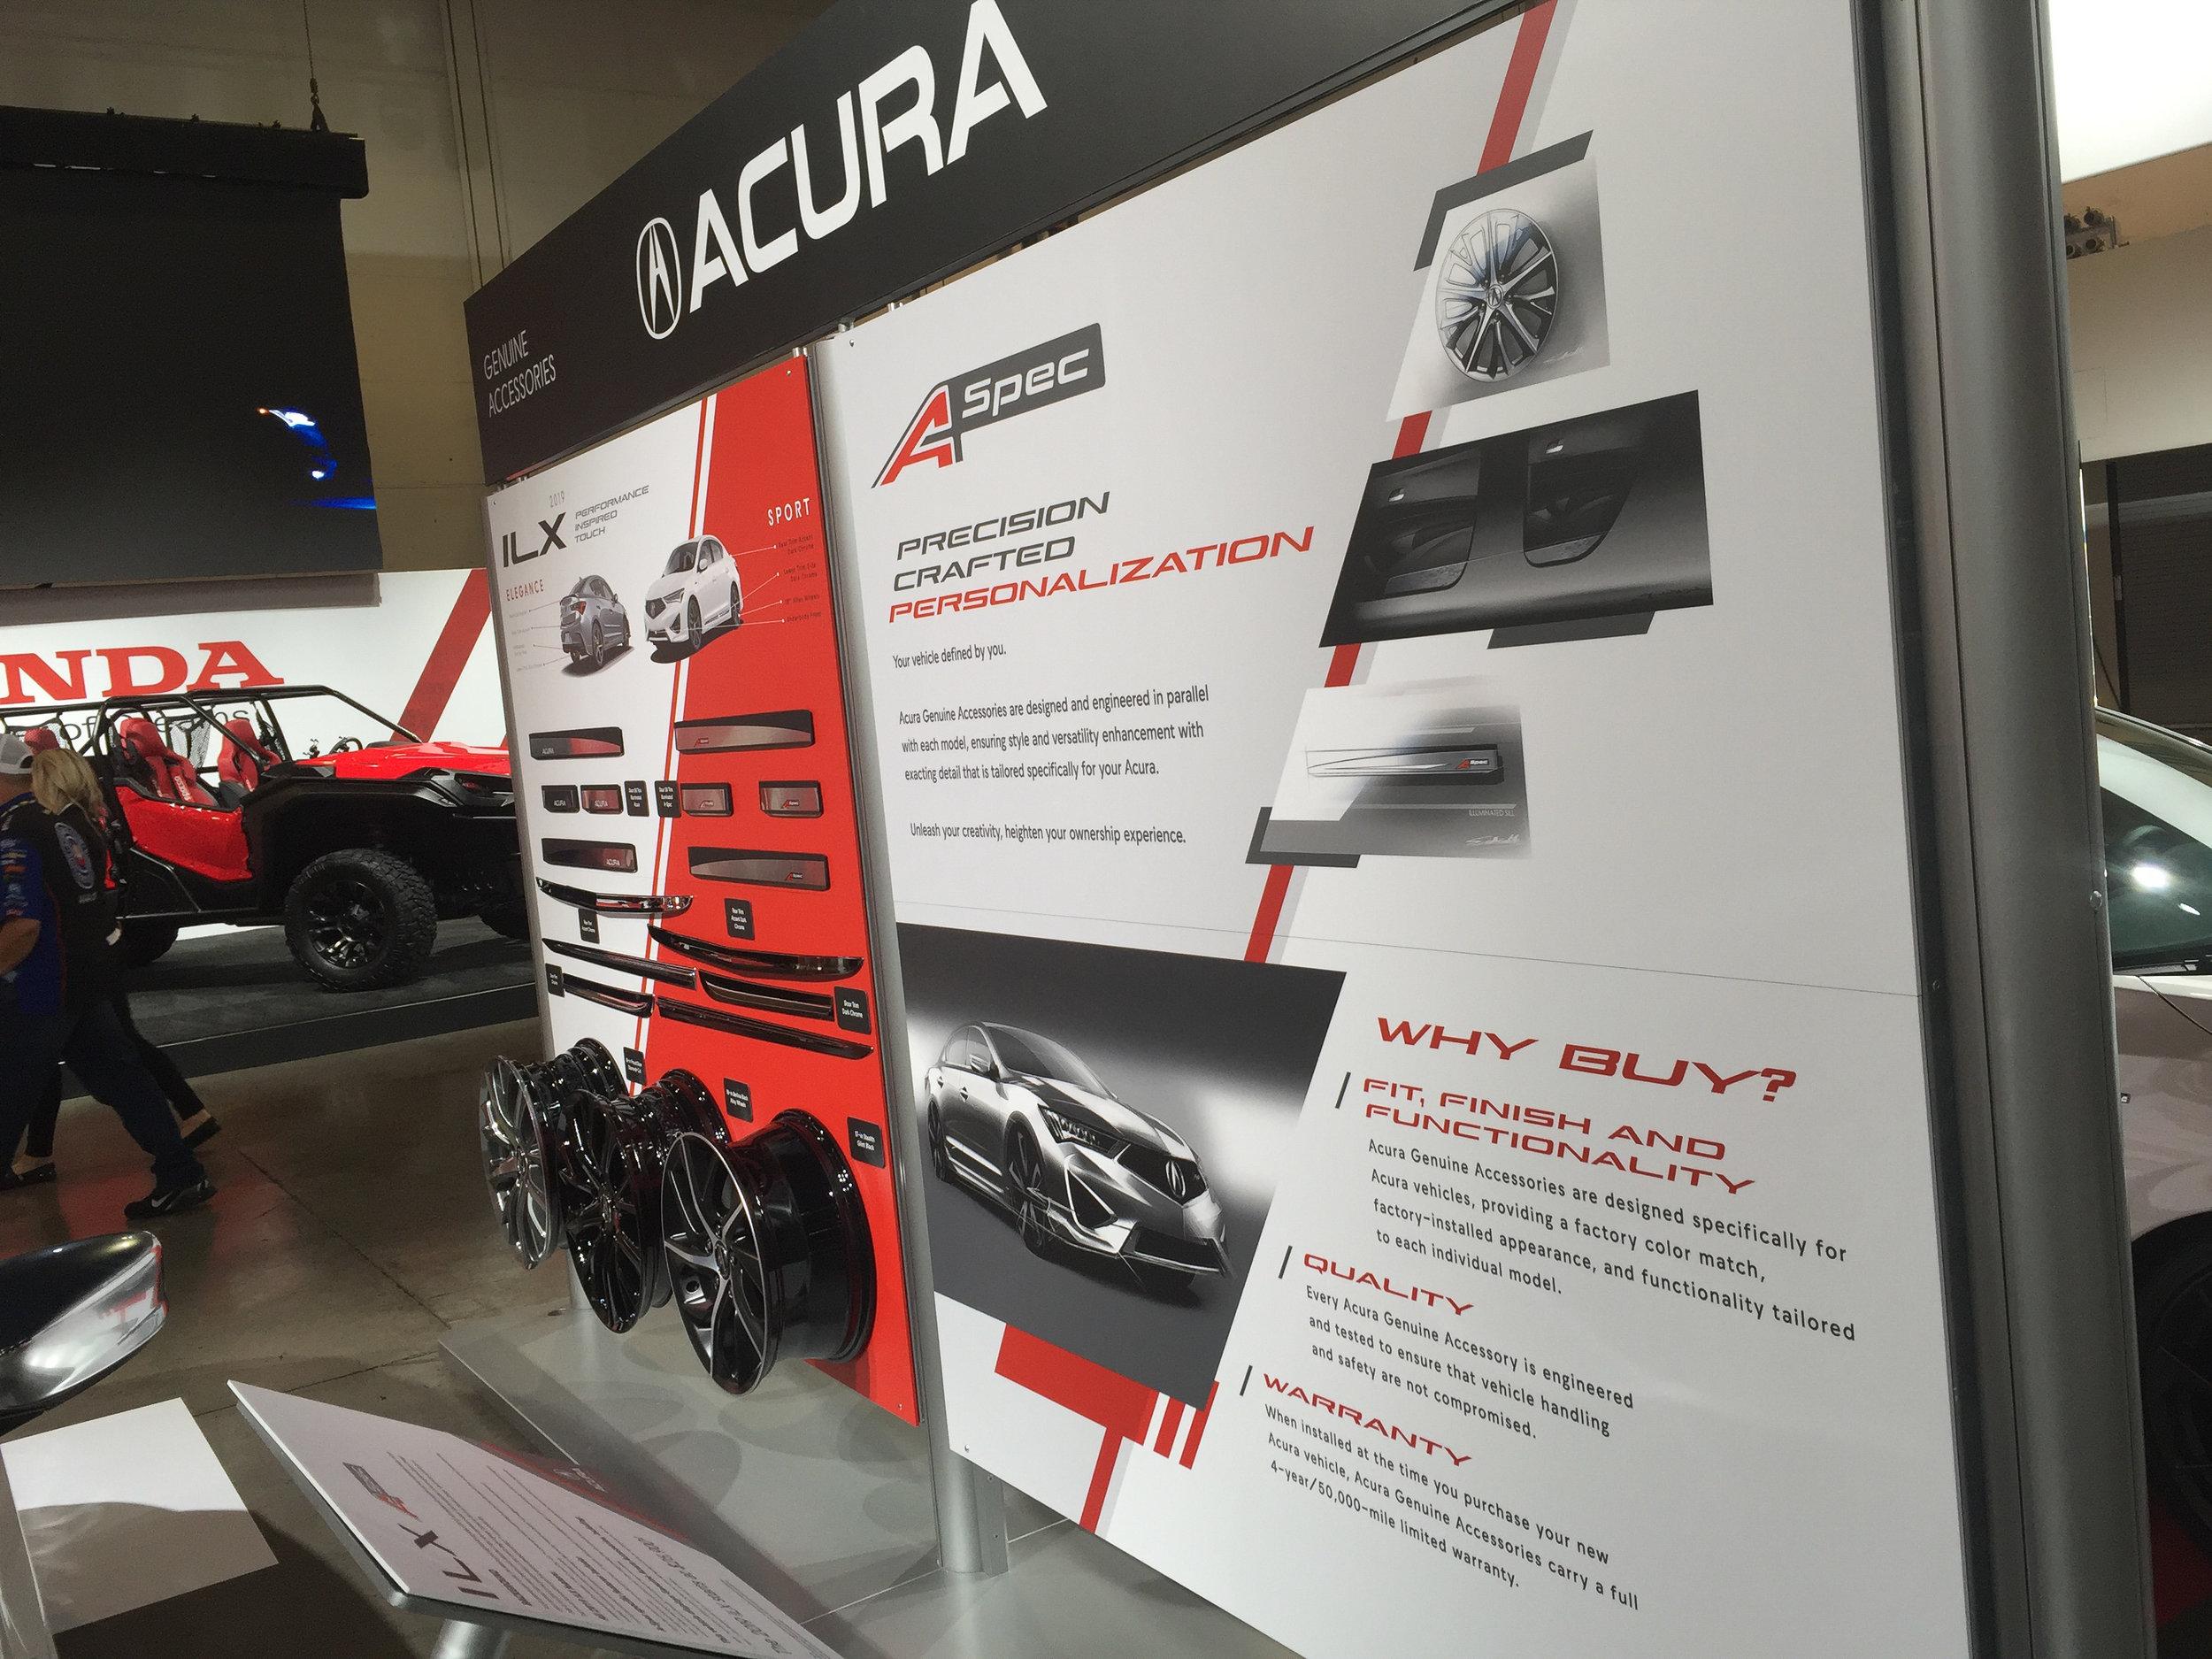 Product Accessory Display, Acura Side, Honda+Acura & GPJ, 2018